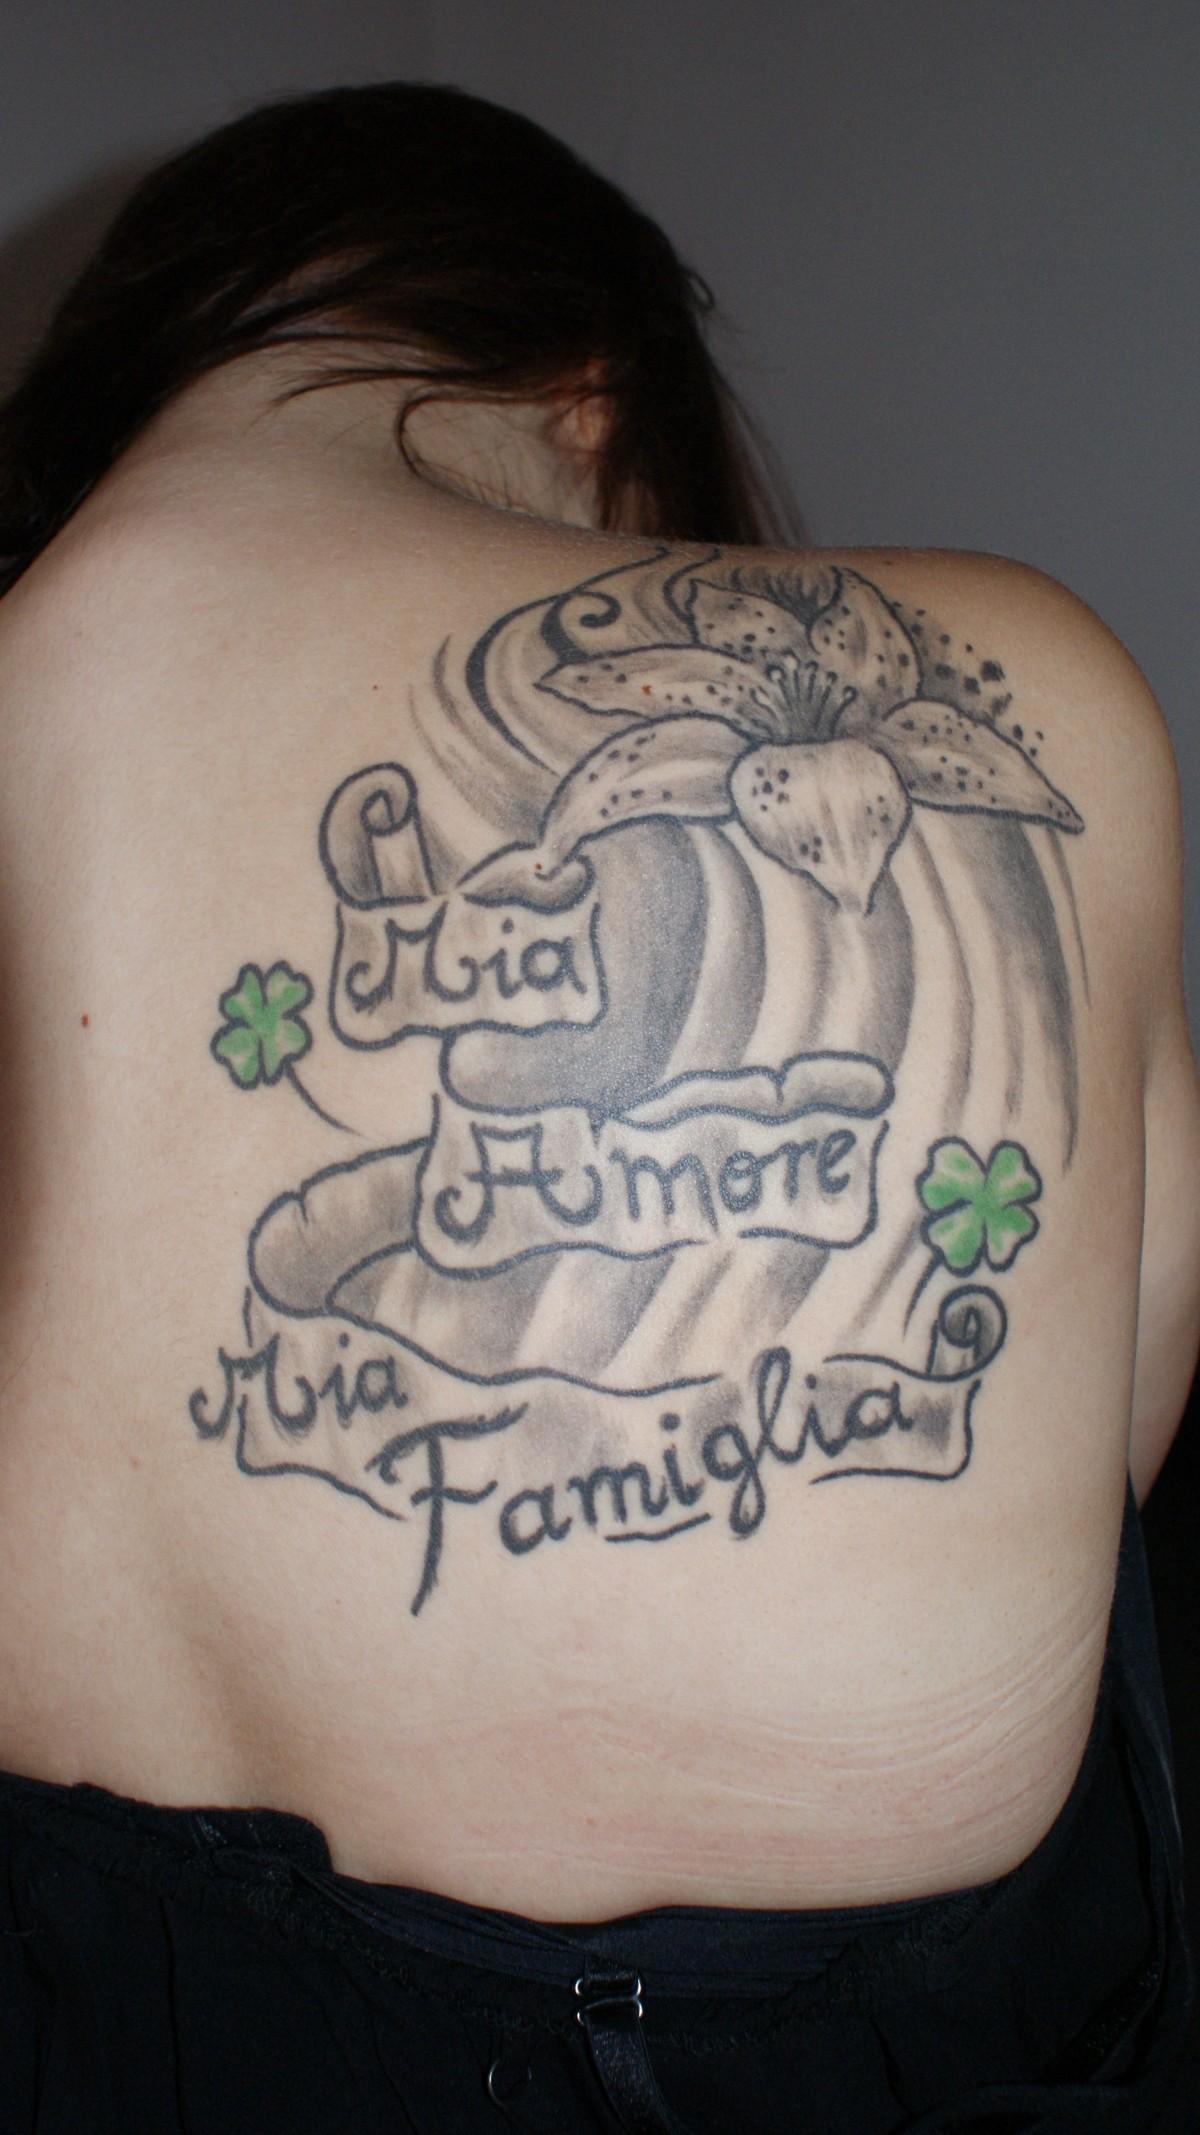 Images gratuites femme tatouage bras poitrine corps humain esquisser dessin bouge toi - Tatouage femme poitrine ...